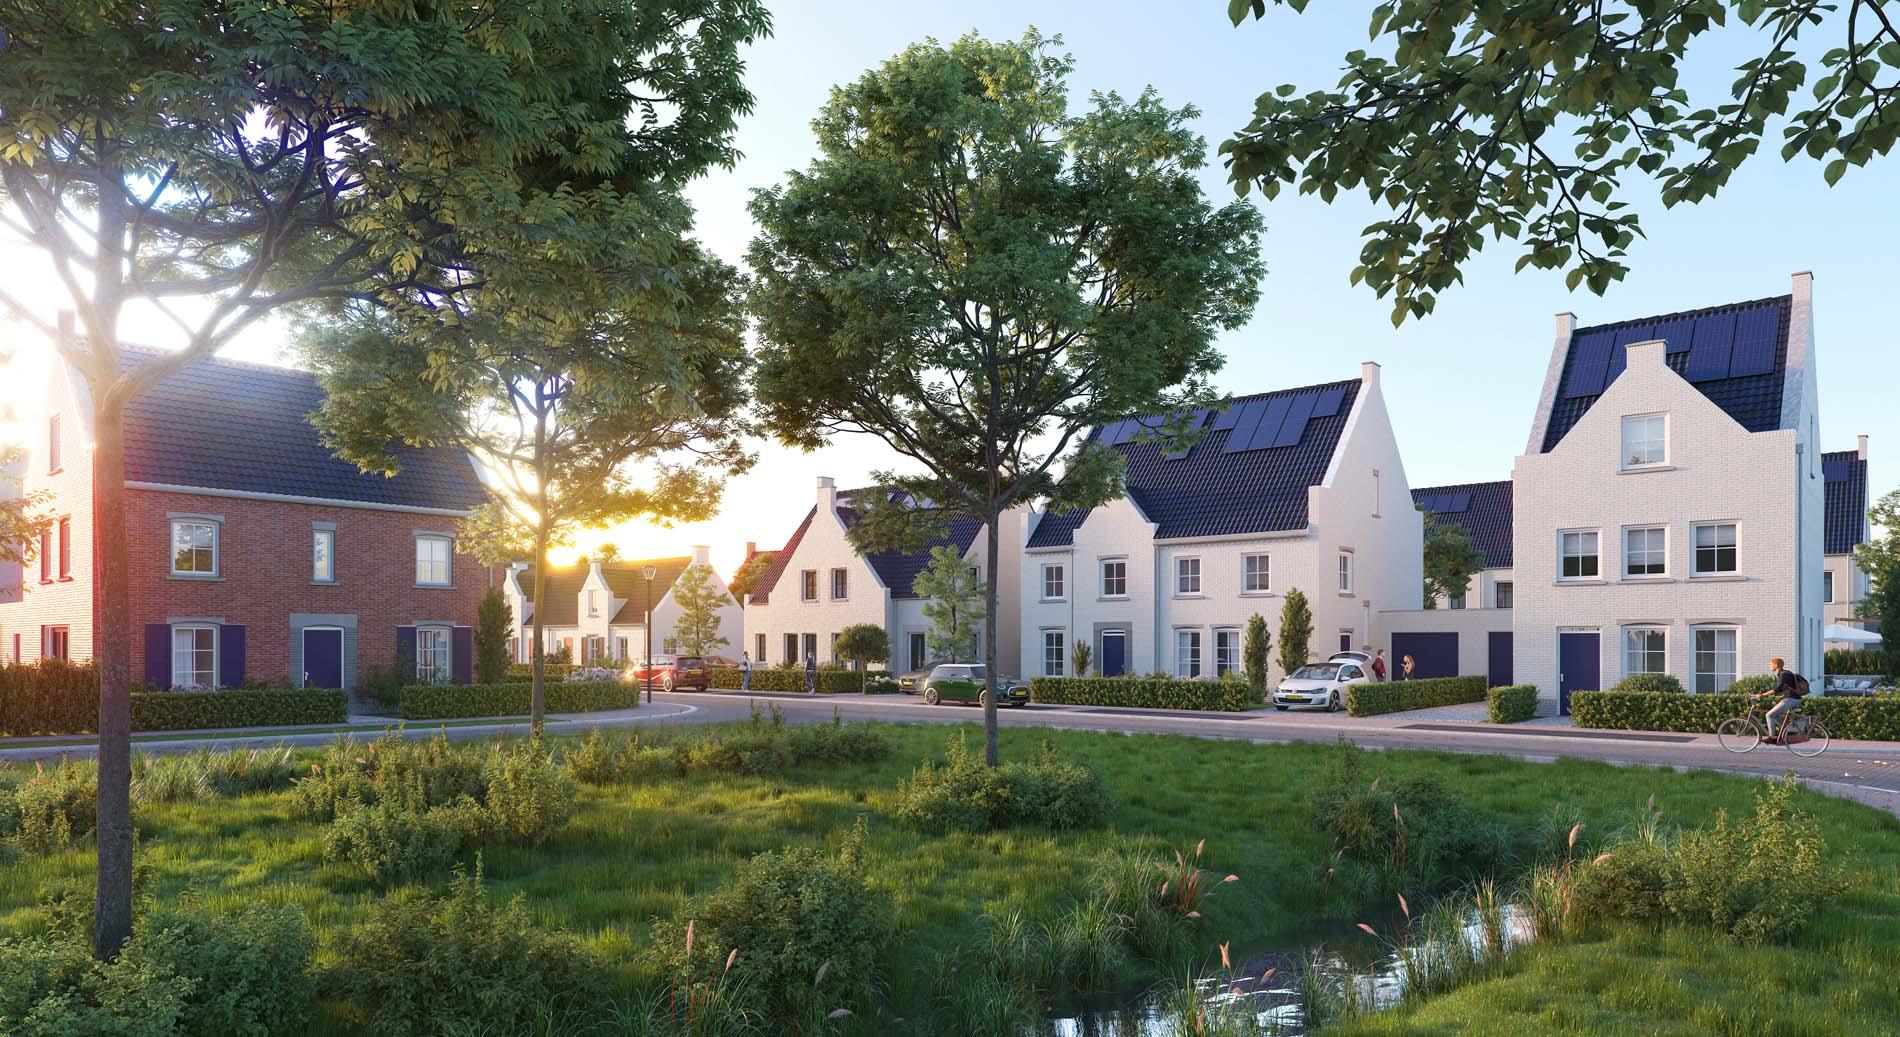 Project LIVING Liverdonk 7 & 8, ASWA Keukens Helmond